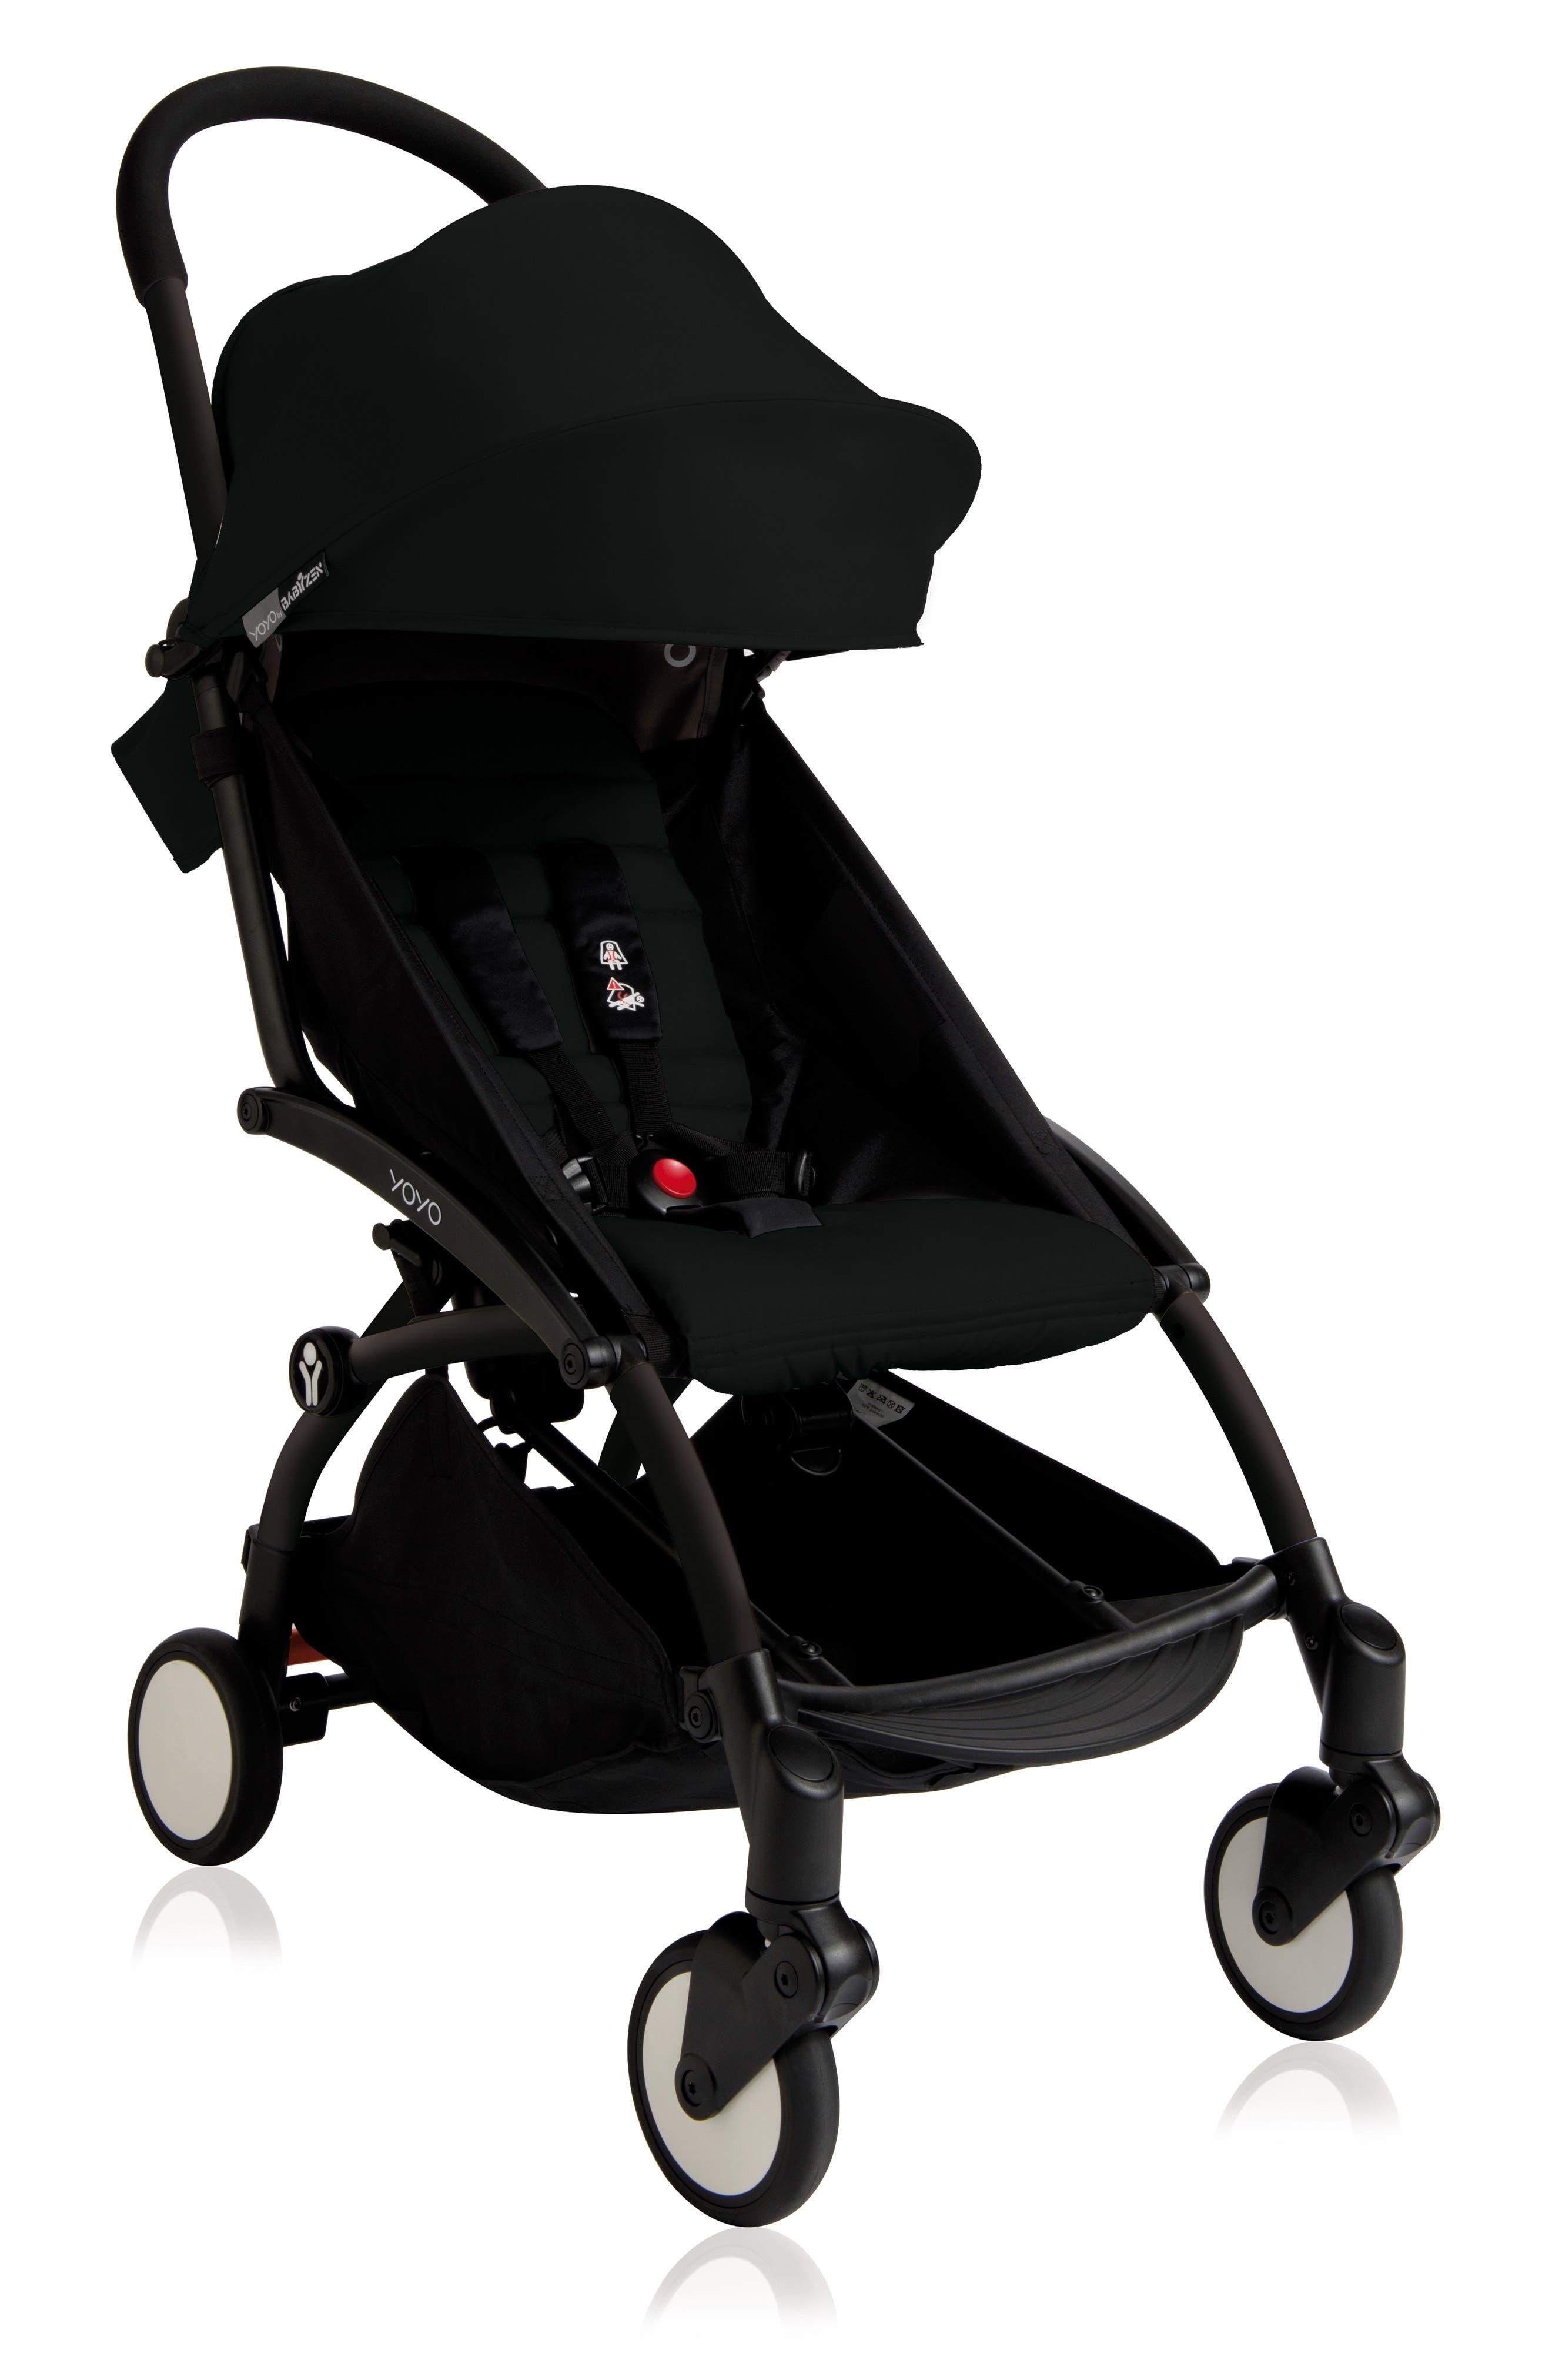 Infant Babyzen(TM) Yoyo Complete Stroller With Travel Bag Black Parasol  New Leg Rest Size One Size  Black